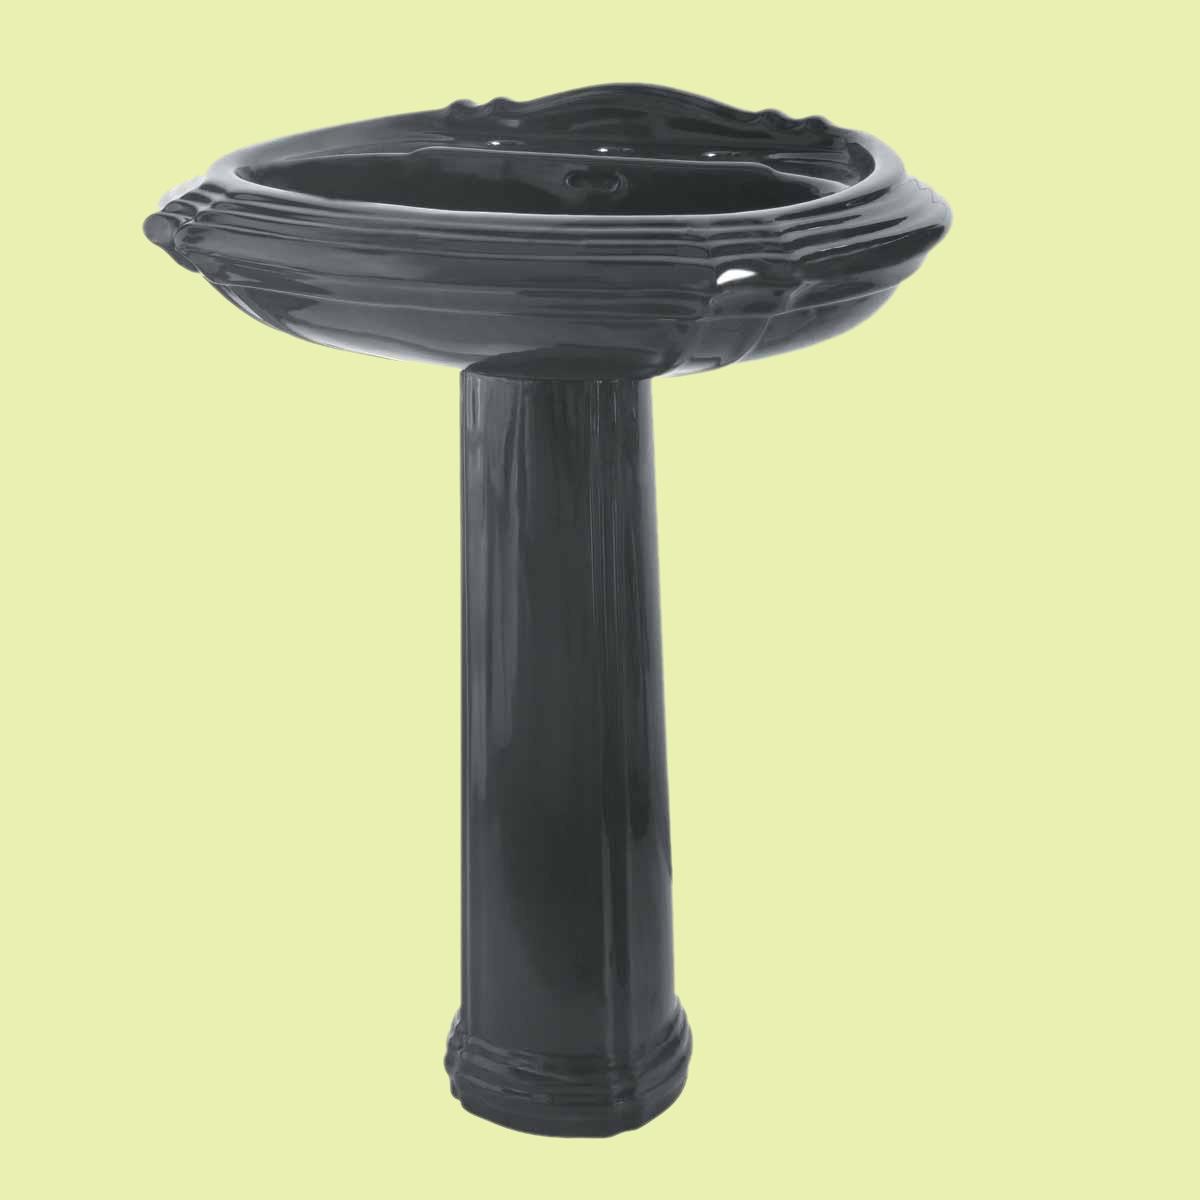 Classic Pedestal Sink Black Bathroom 4